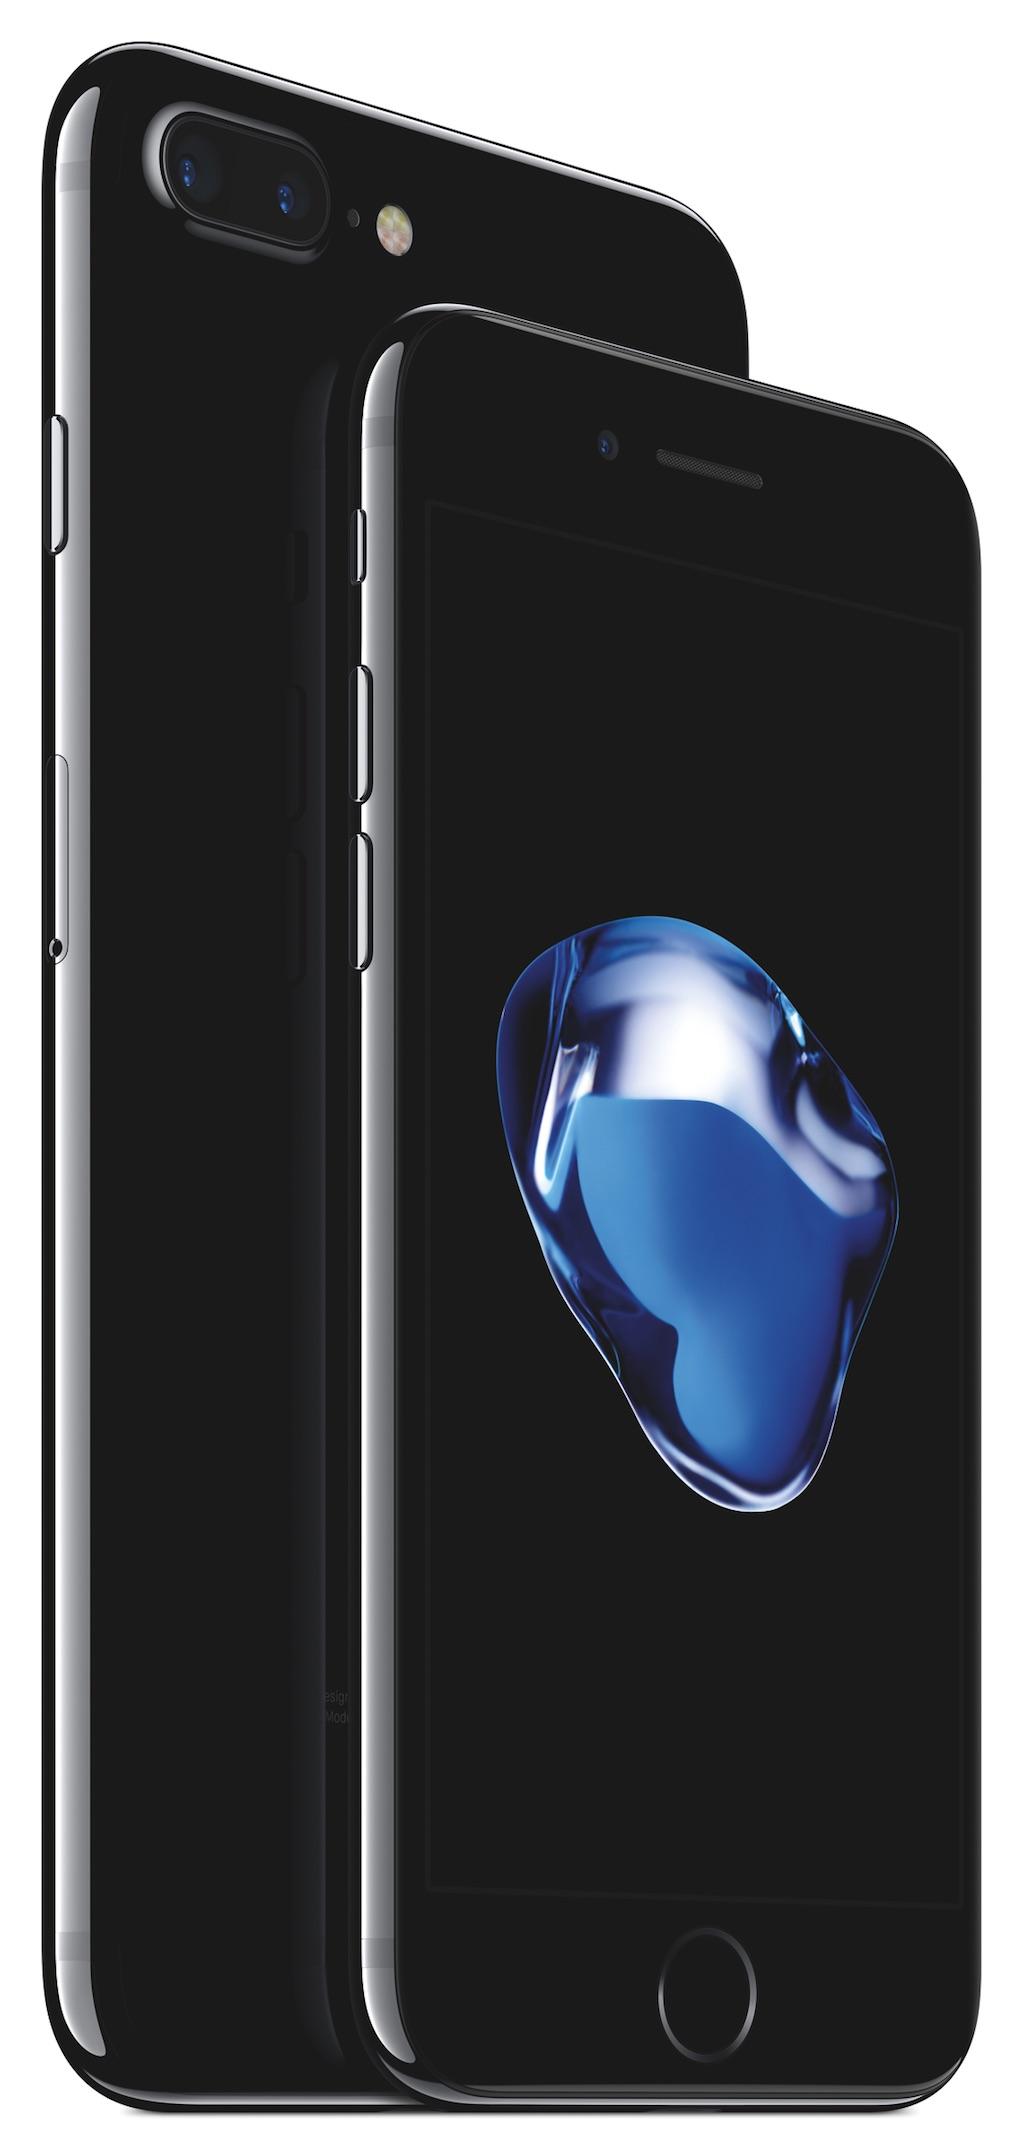 Iphone 7 Bei O2 Finanzieren Macerkopf